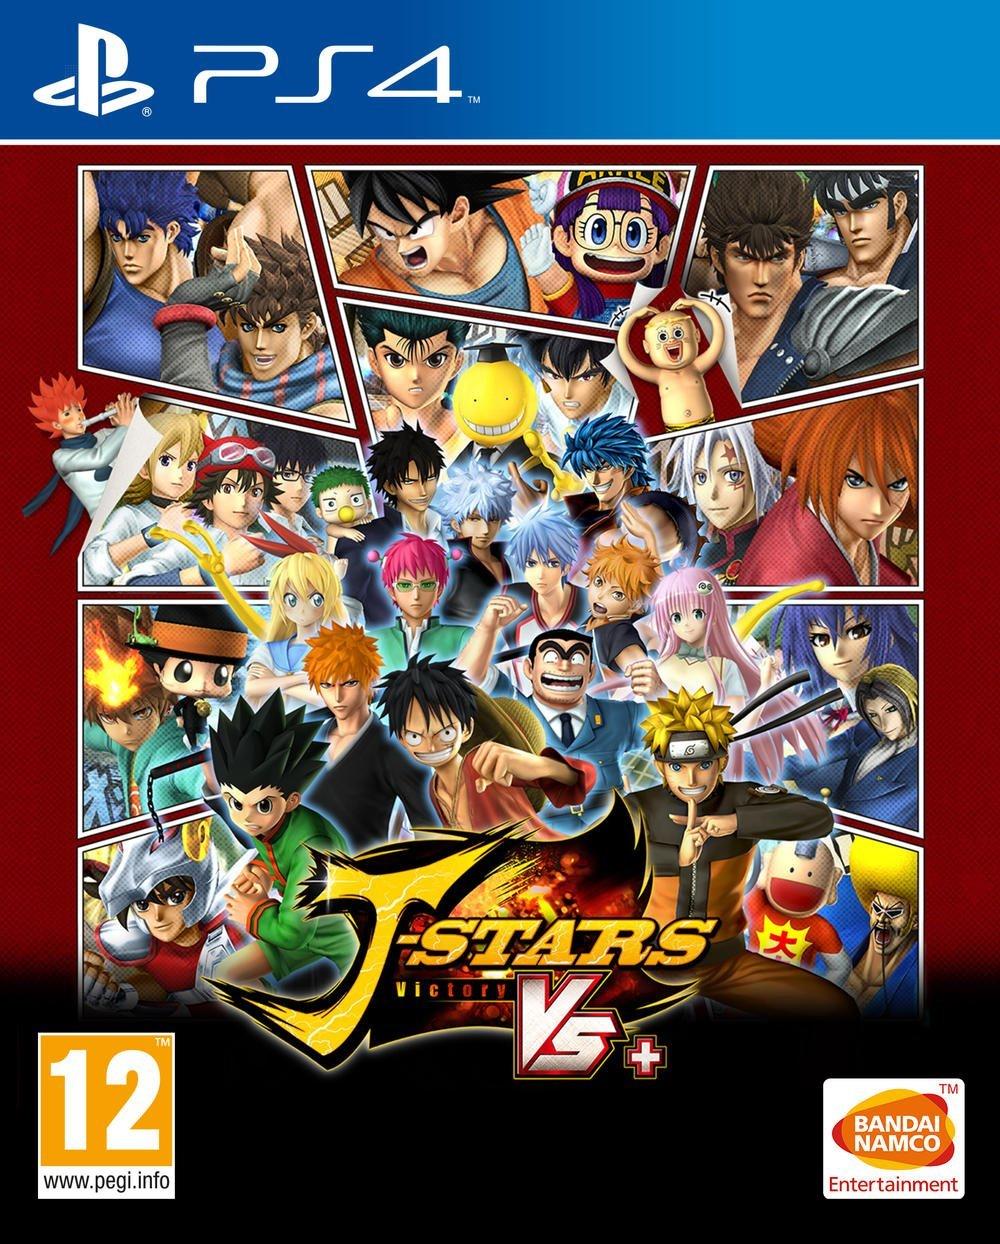 J-StarsVictoryVs PS4 Jaquette 001